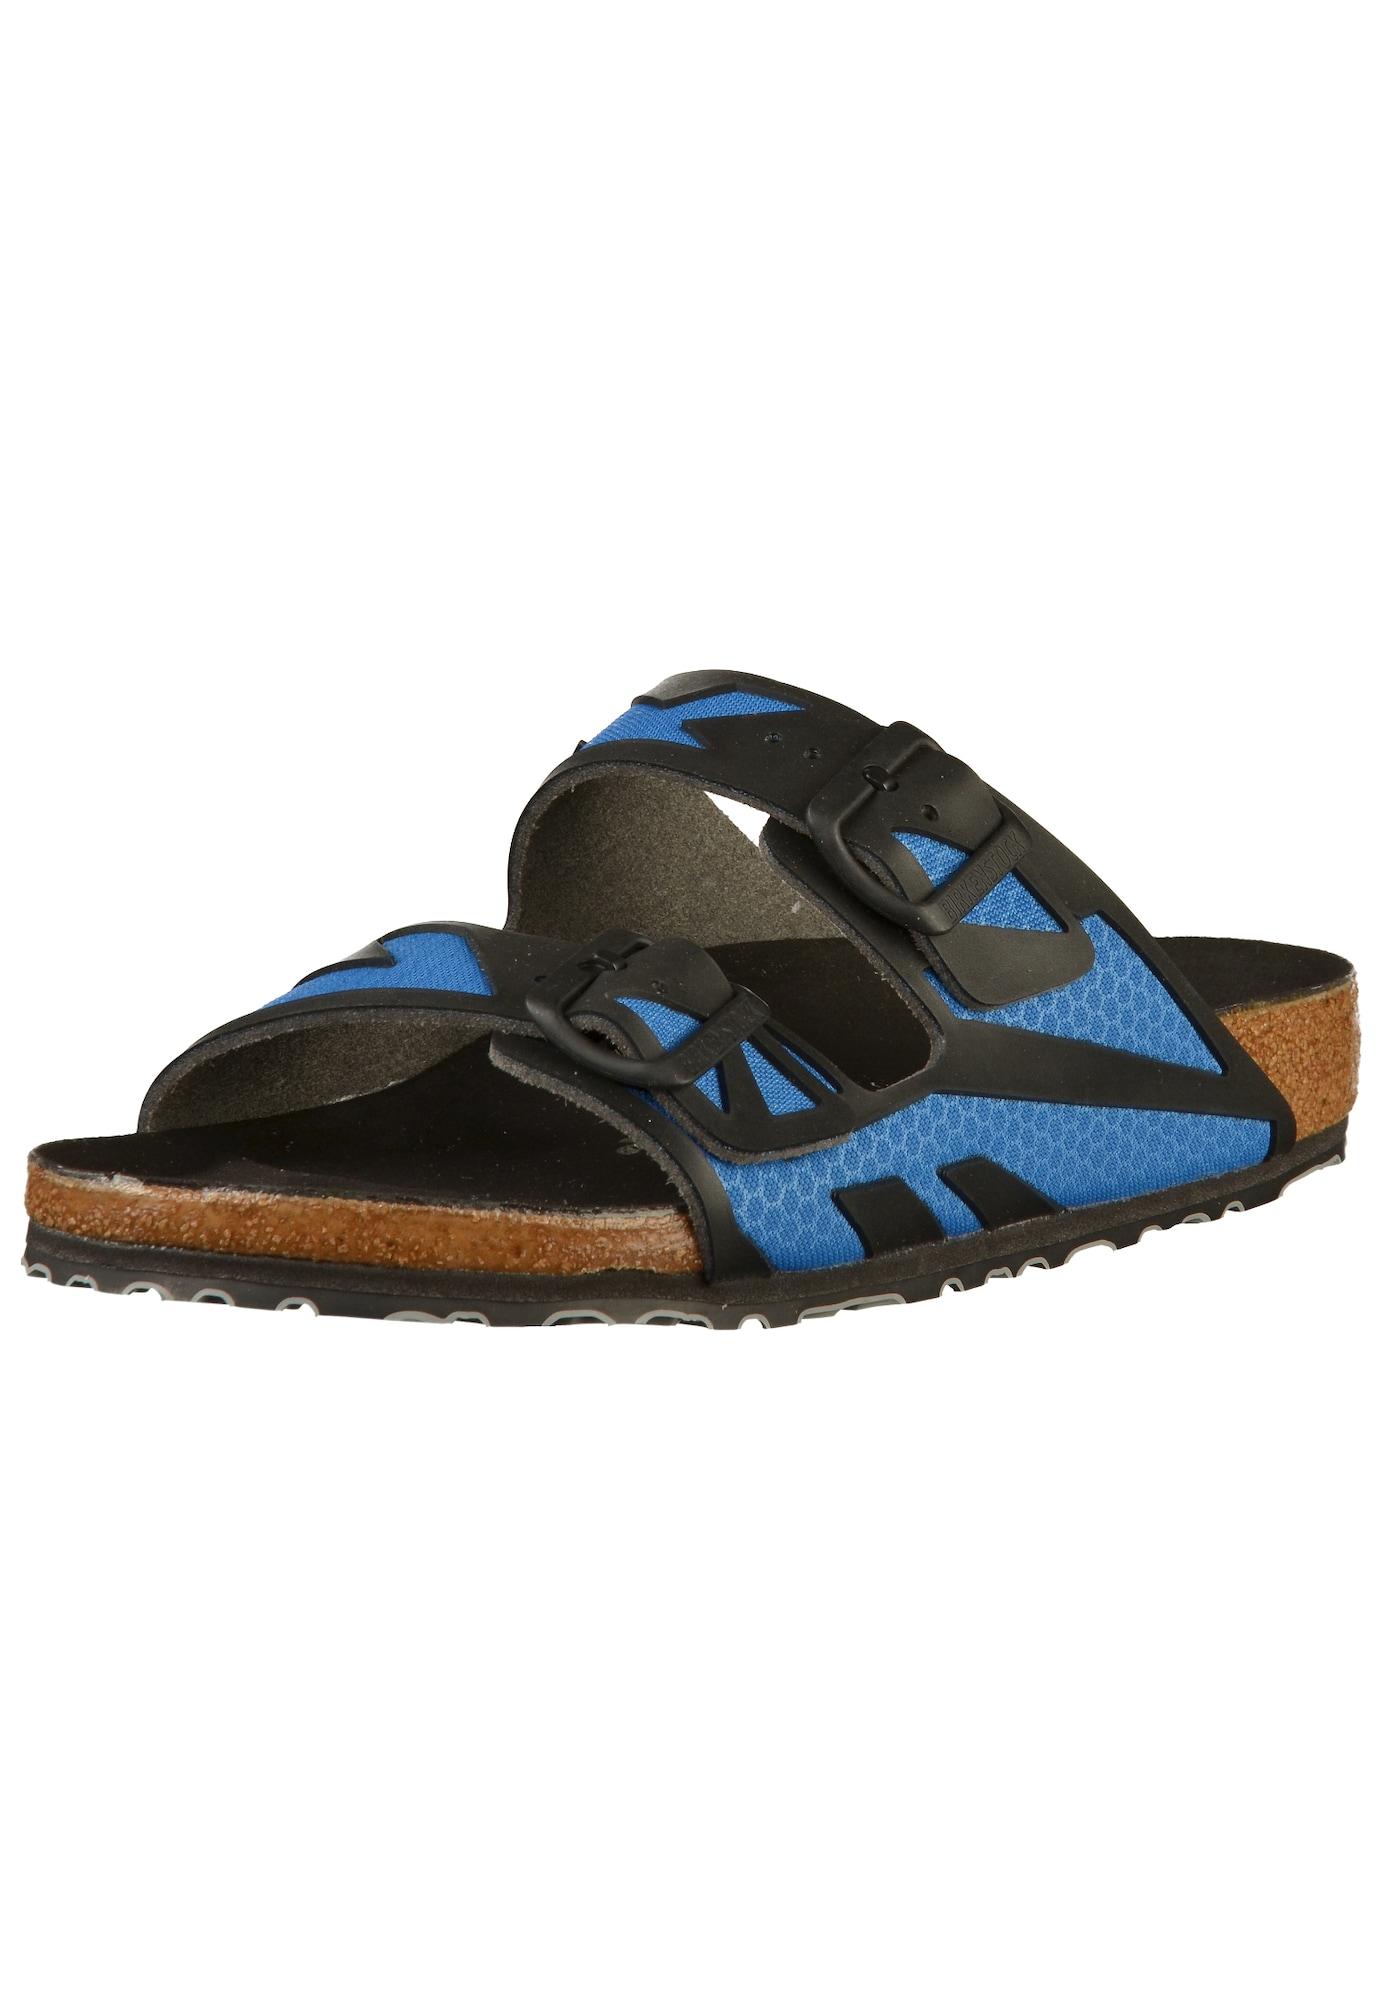 Pantoletten 'Arizona'   Schuhe > Clogs & Pantoletten   Birkenstock